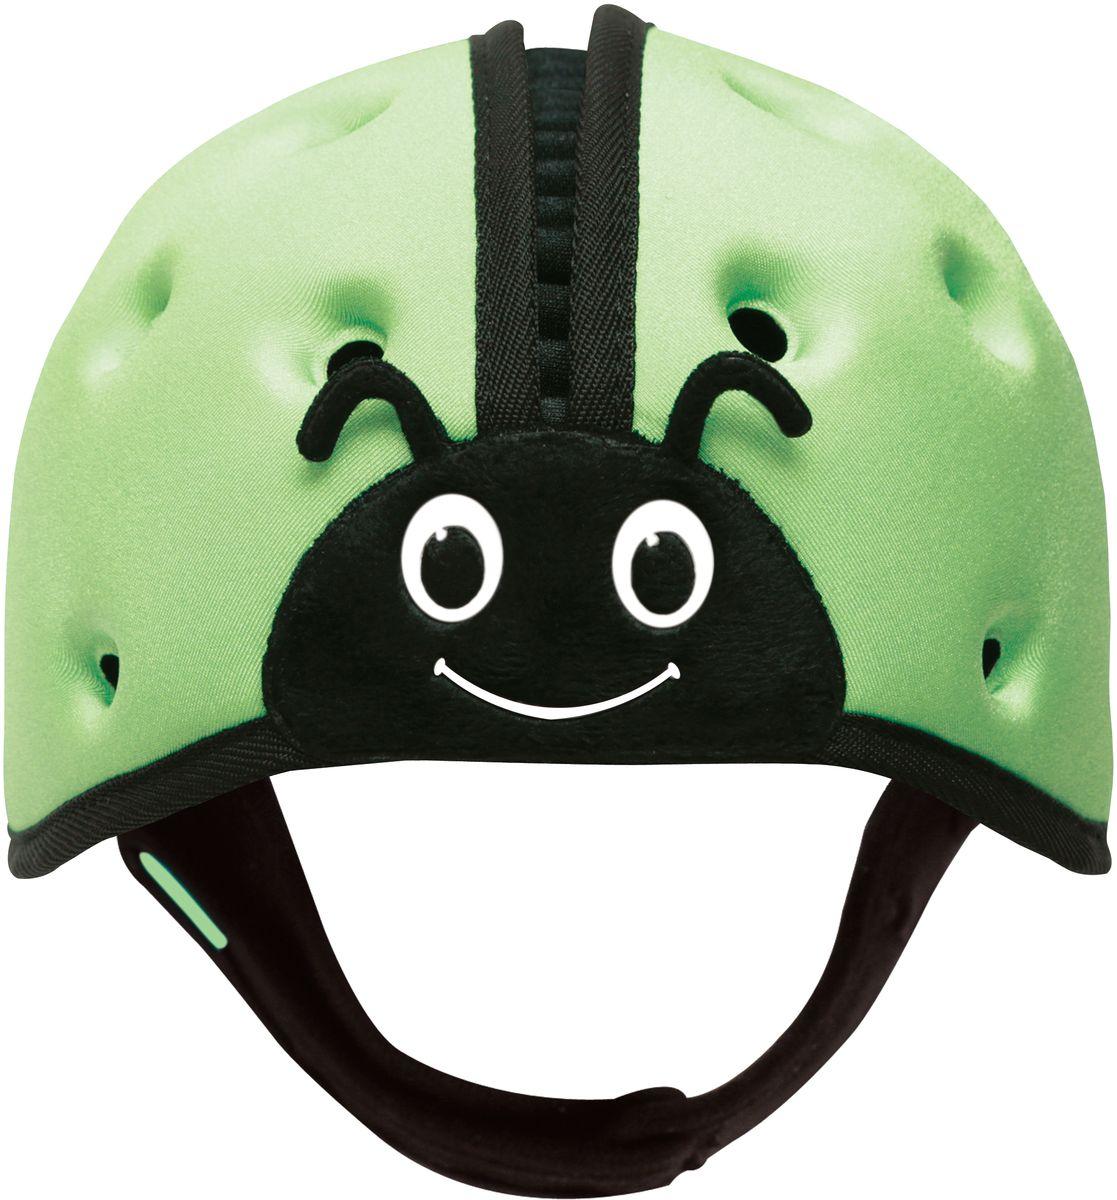 SafeheadBABY Шапка-шлем Божья коровка цвет зеленый